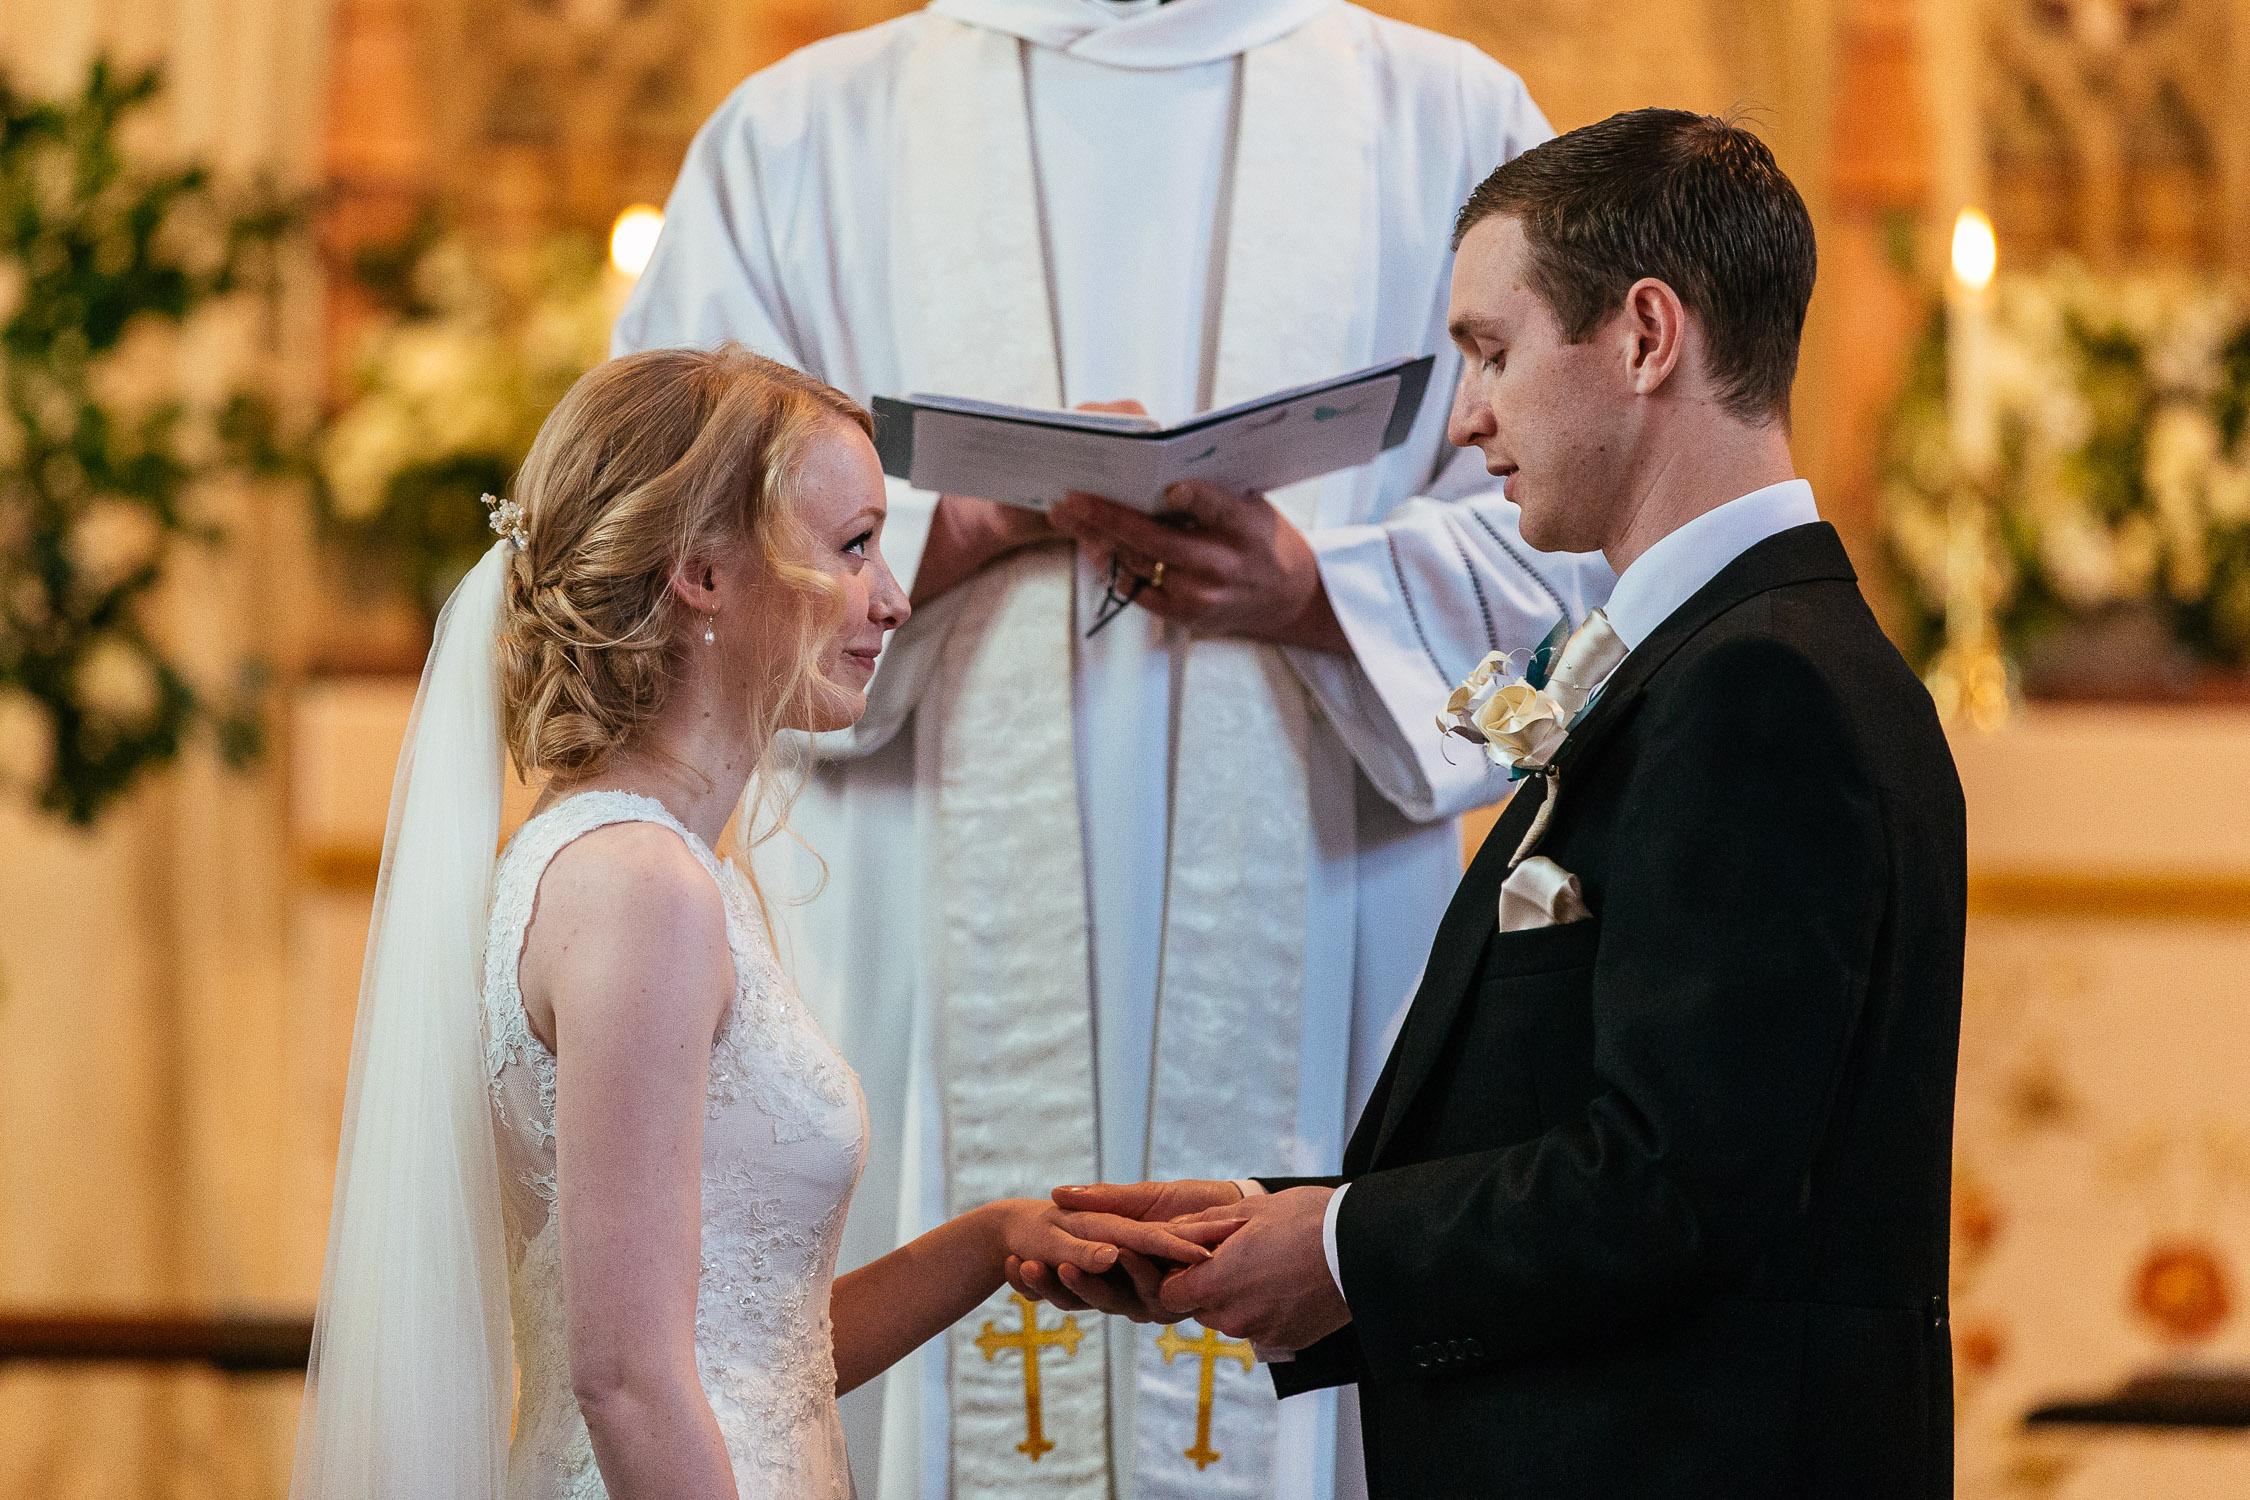 Lizi-and-Mark-Wedding-Highlights-30.jpg